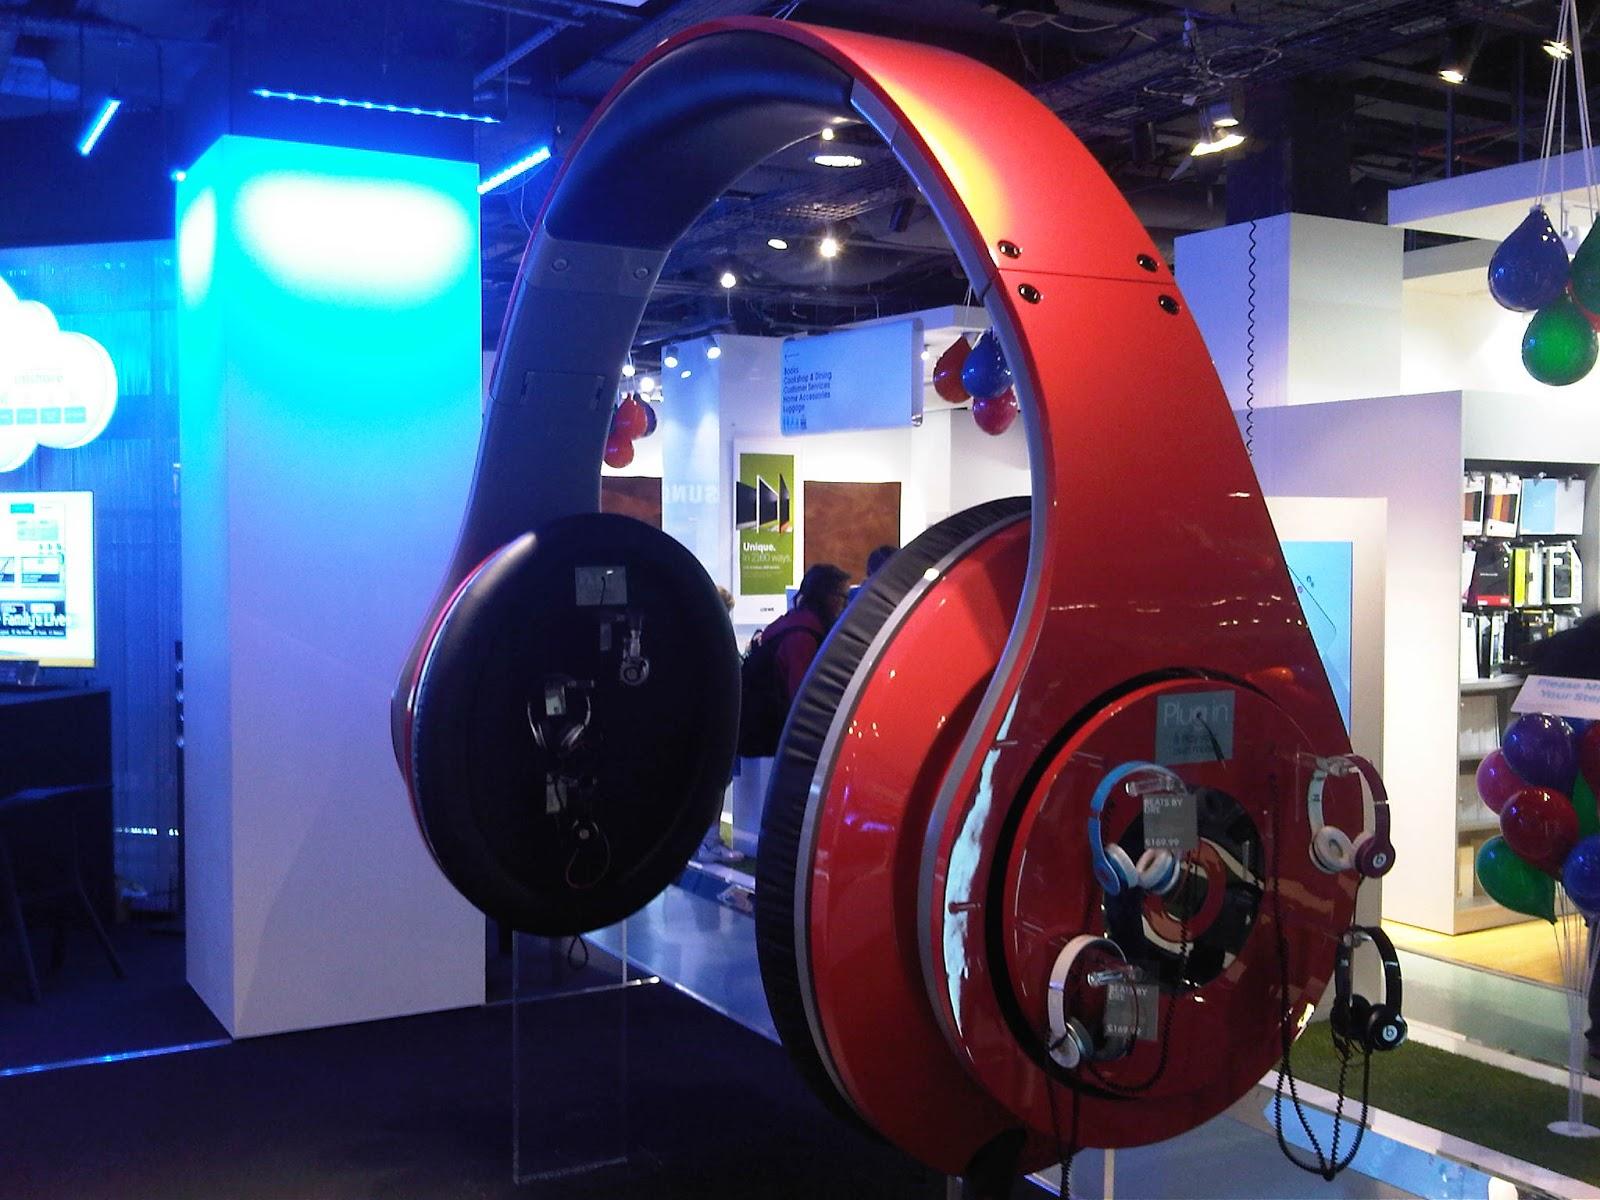 Worlds largest headphones